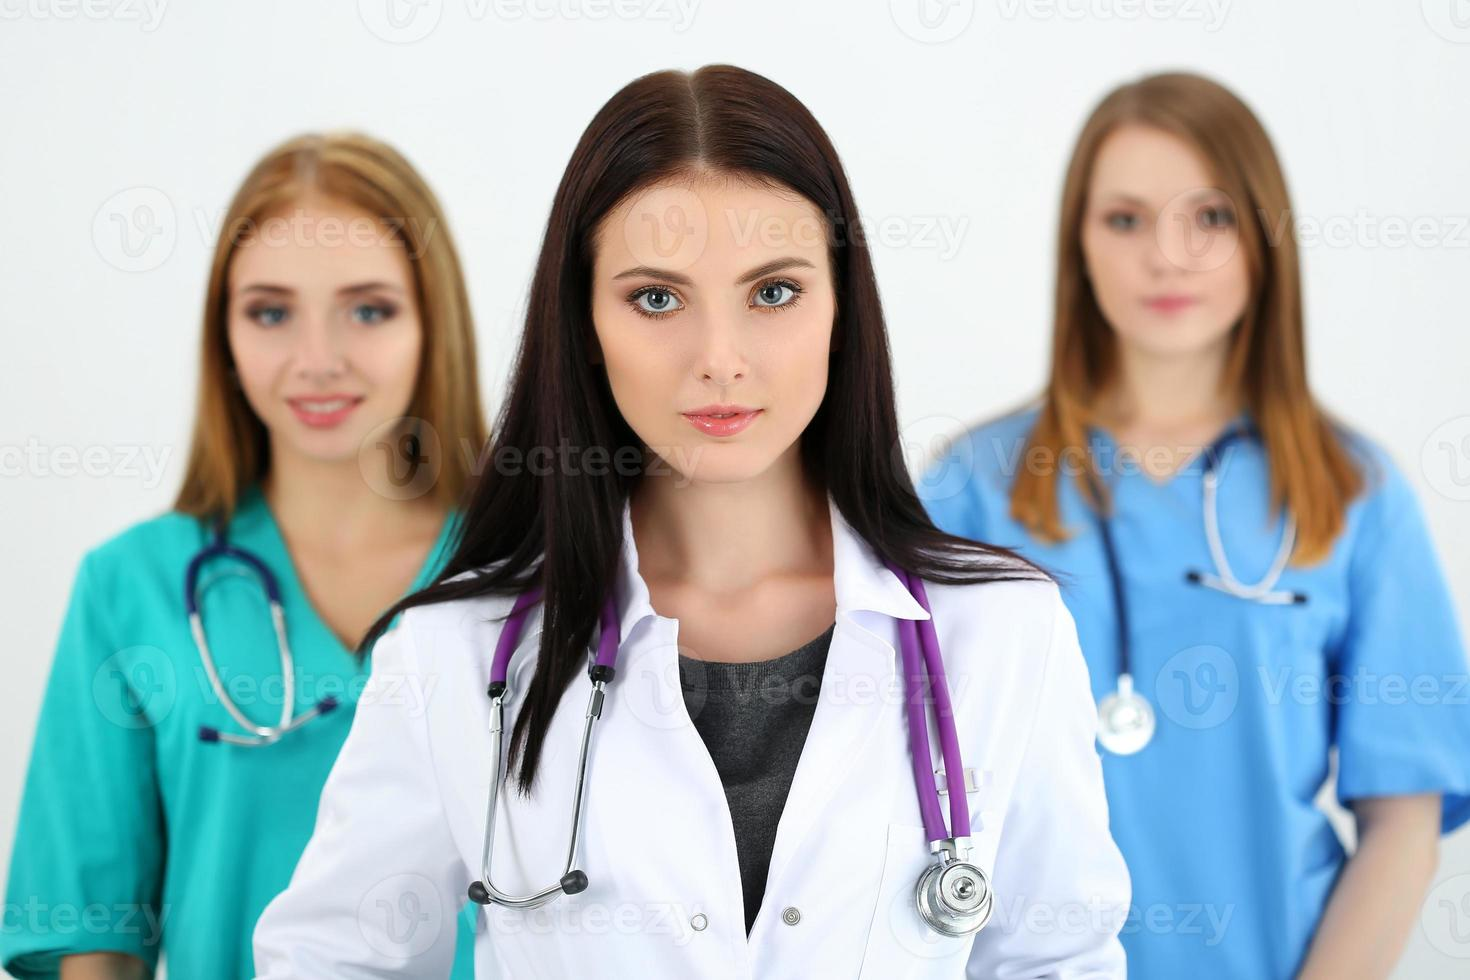 Porträt der jungen brünetten Ärztin foto